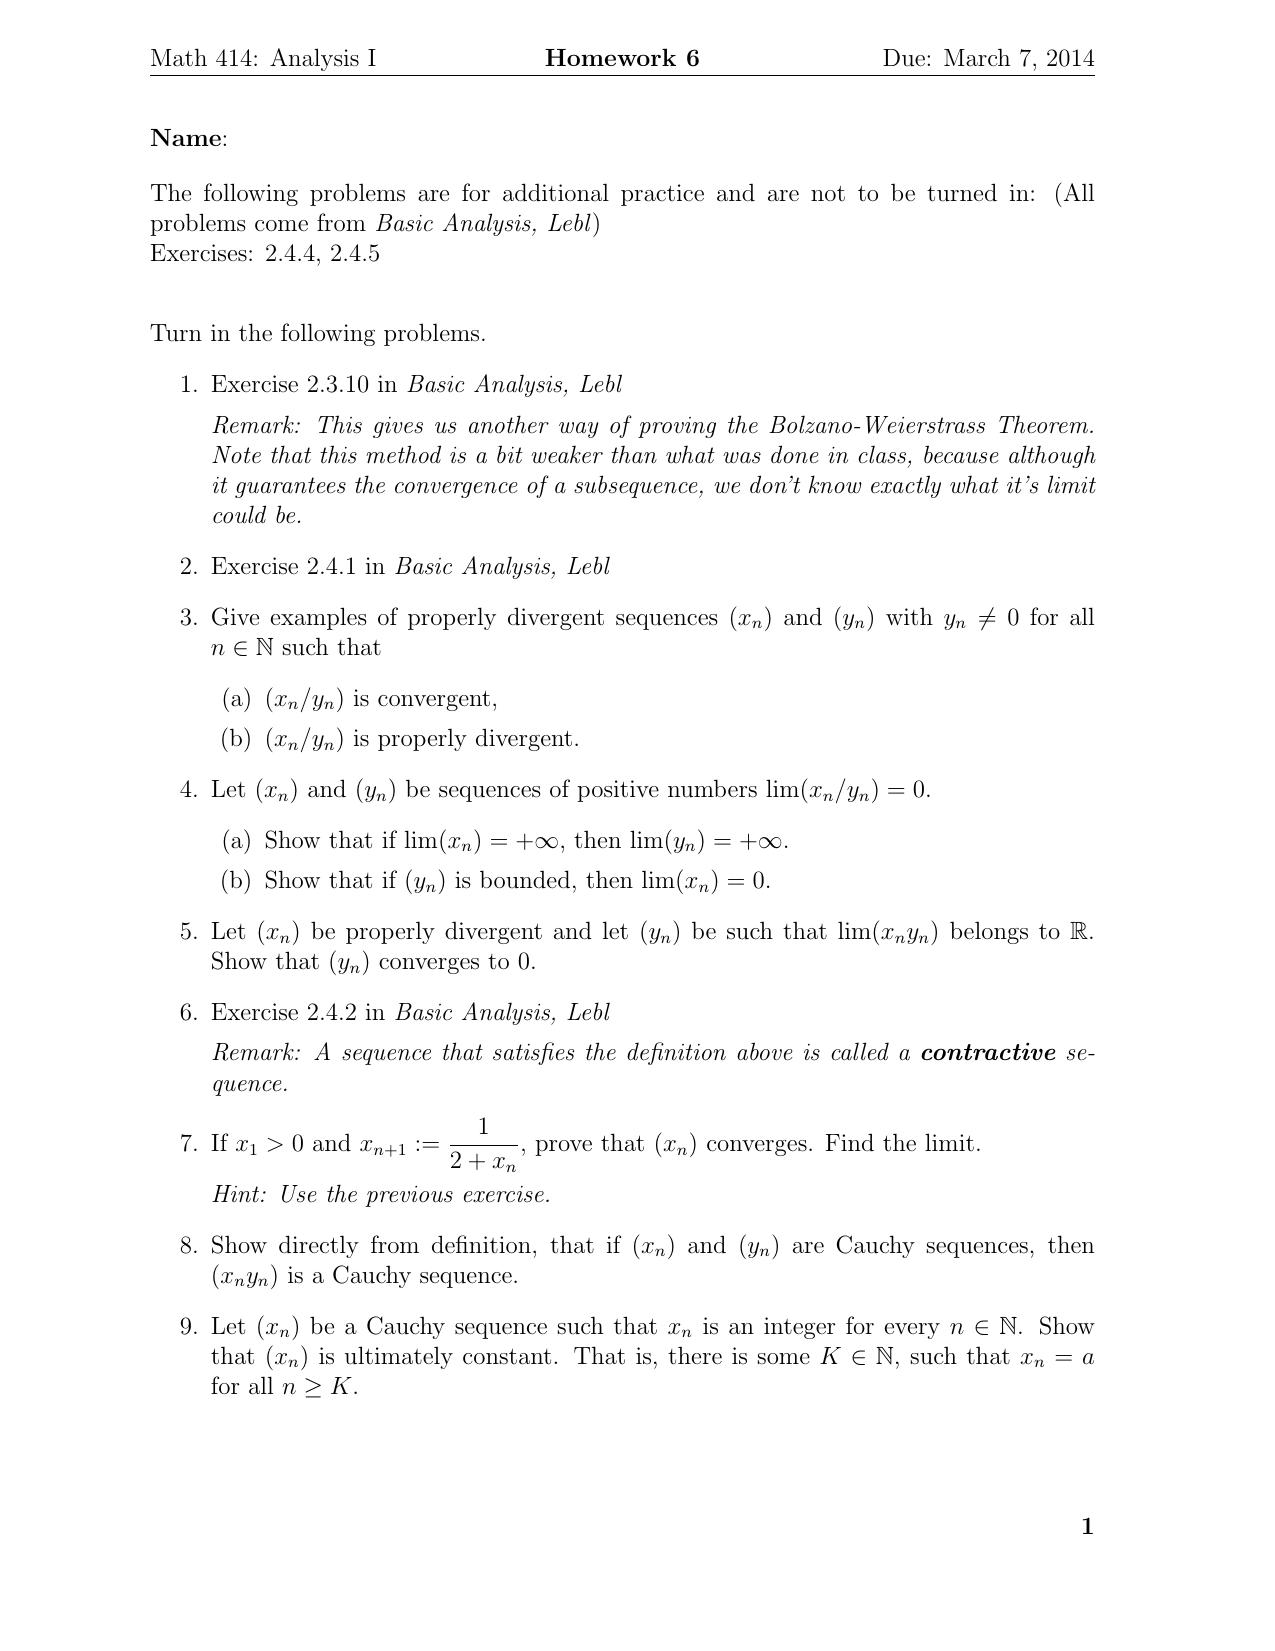 Math 414: Analysis I Homework 6 Due: March 7, 2014 Name: